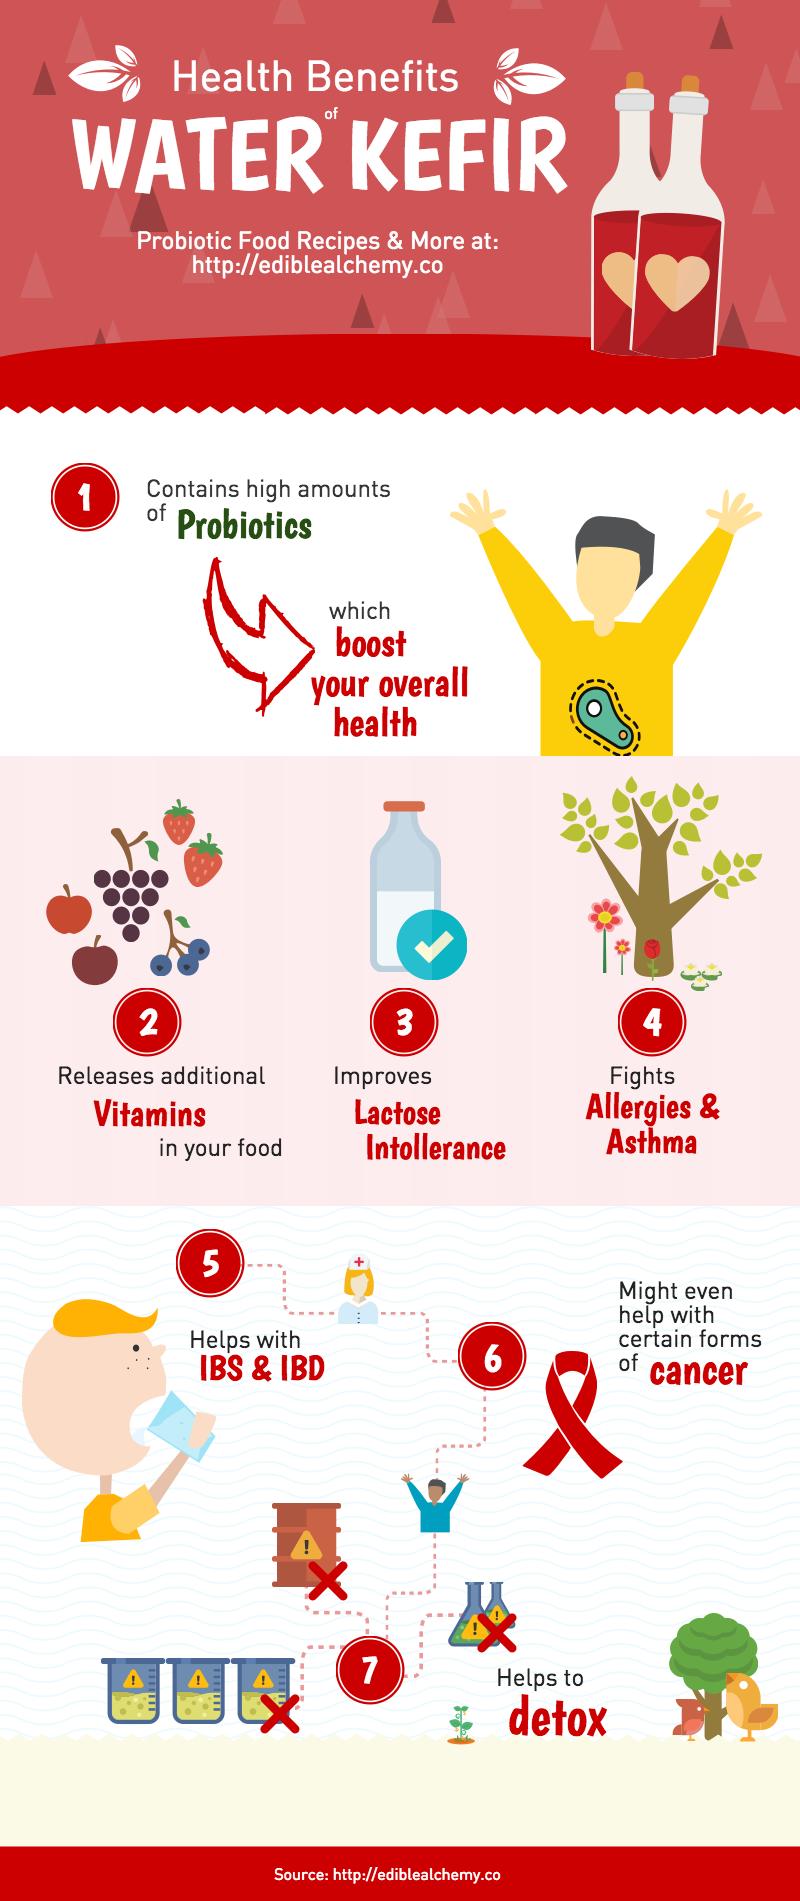 Water Kefir Health Benefits Infographic